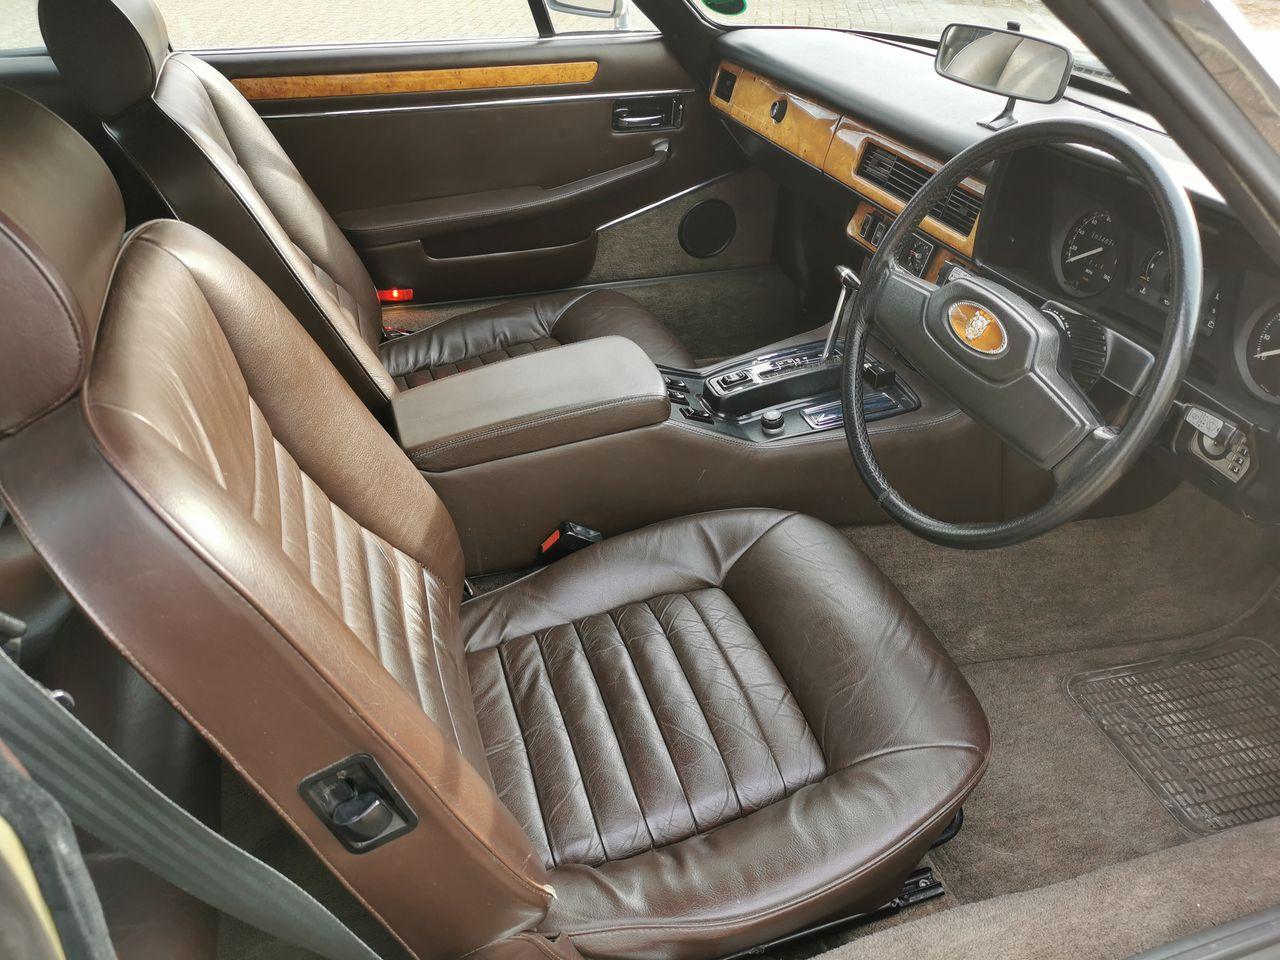 1983 Lynx Eventer interior